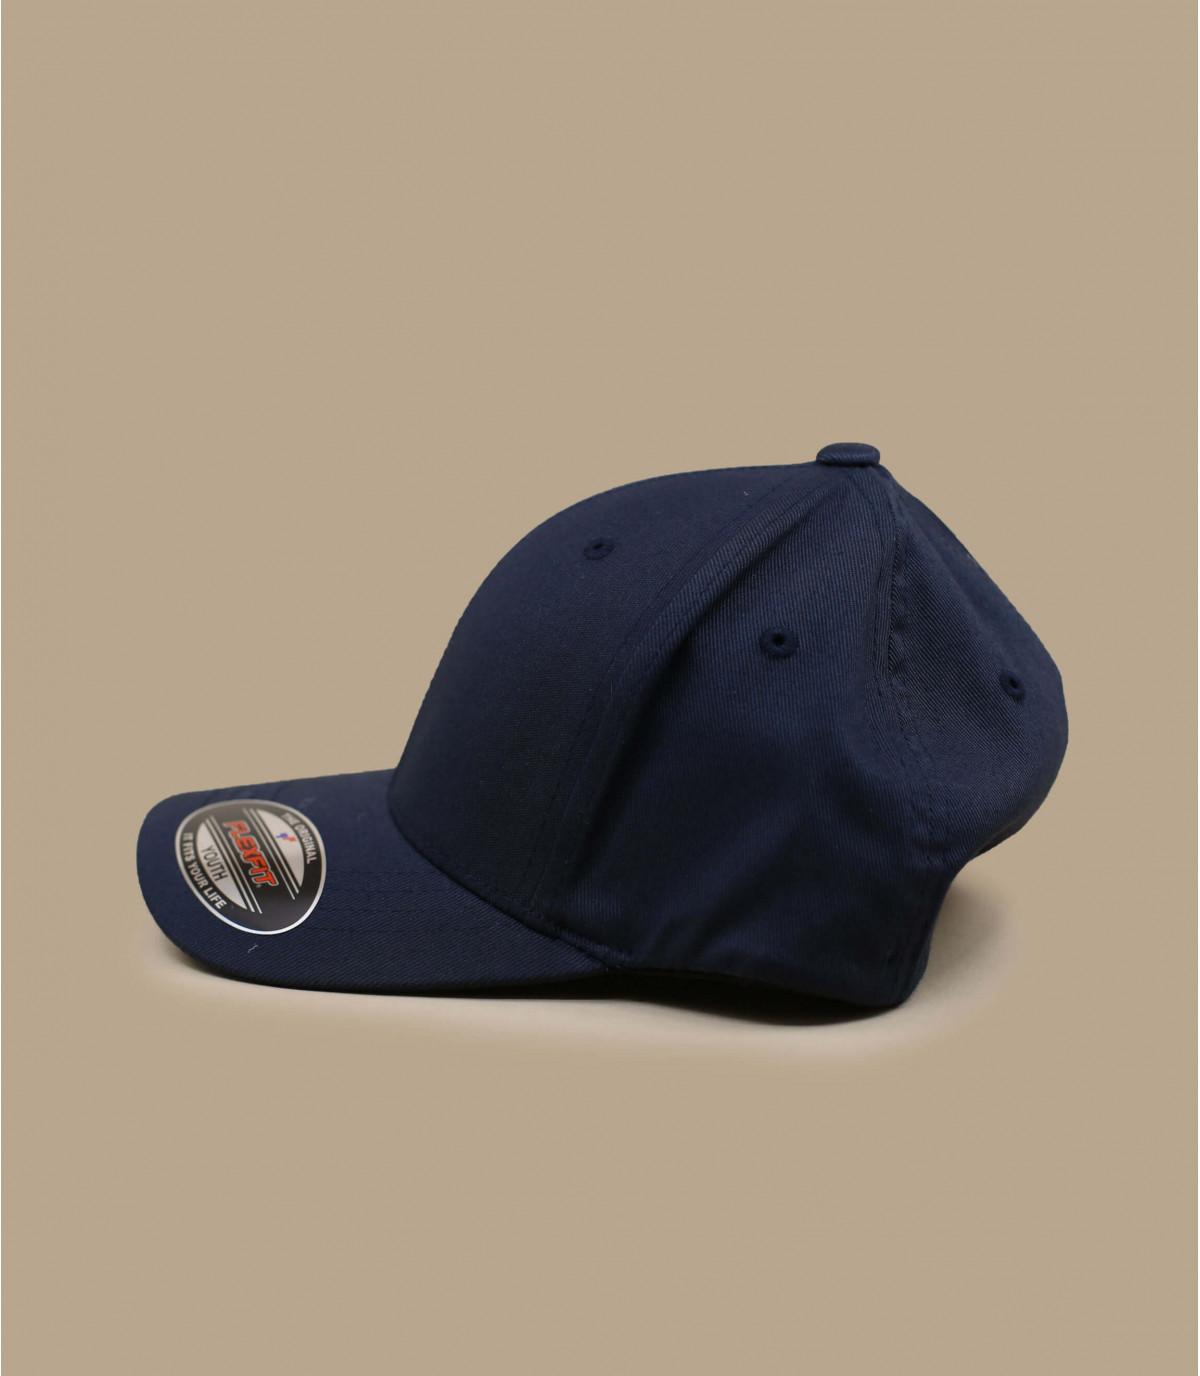 Flexfit cap navy kids